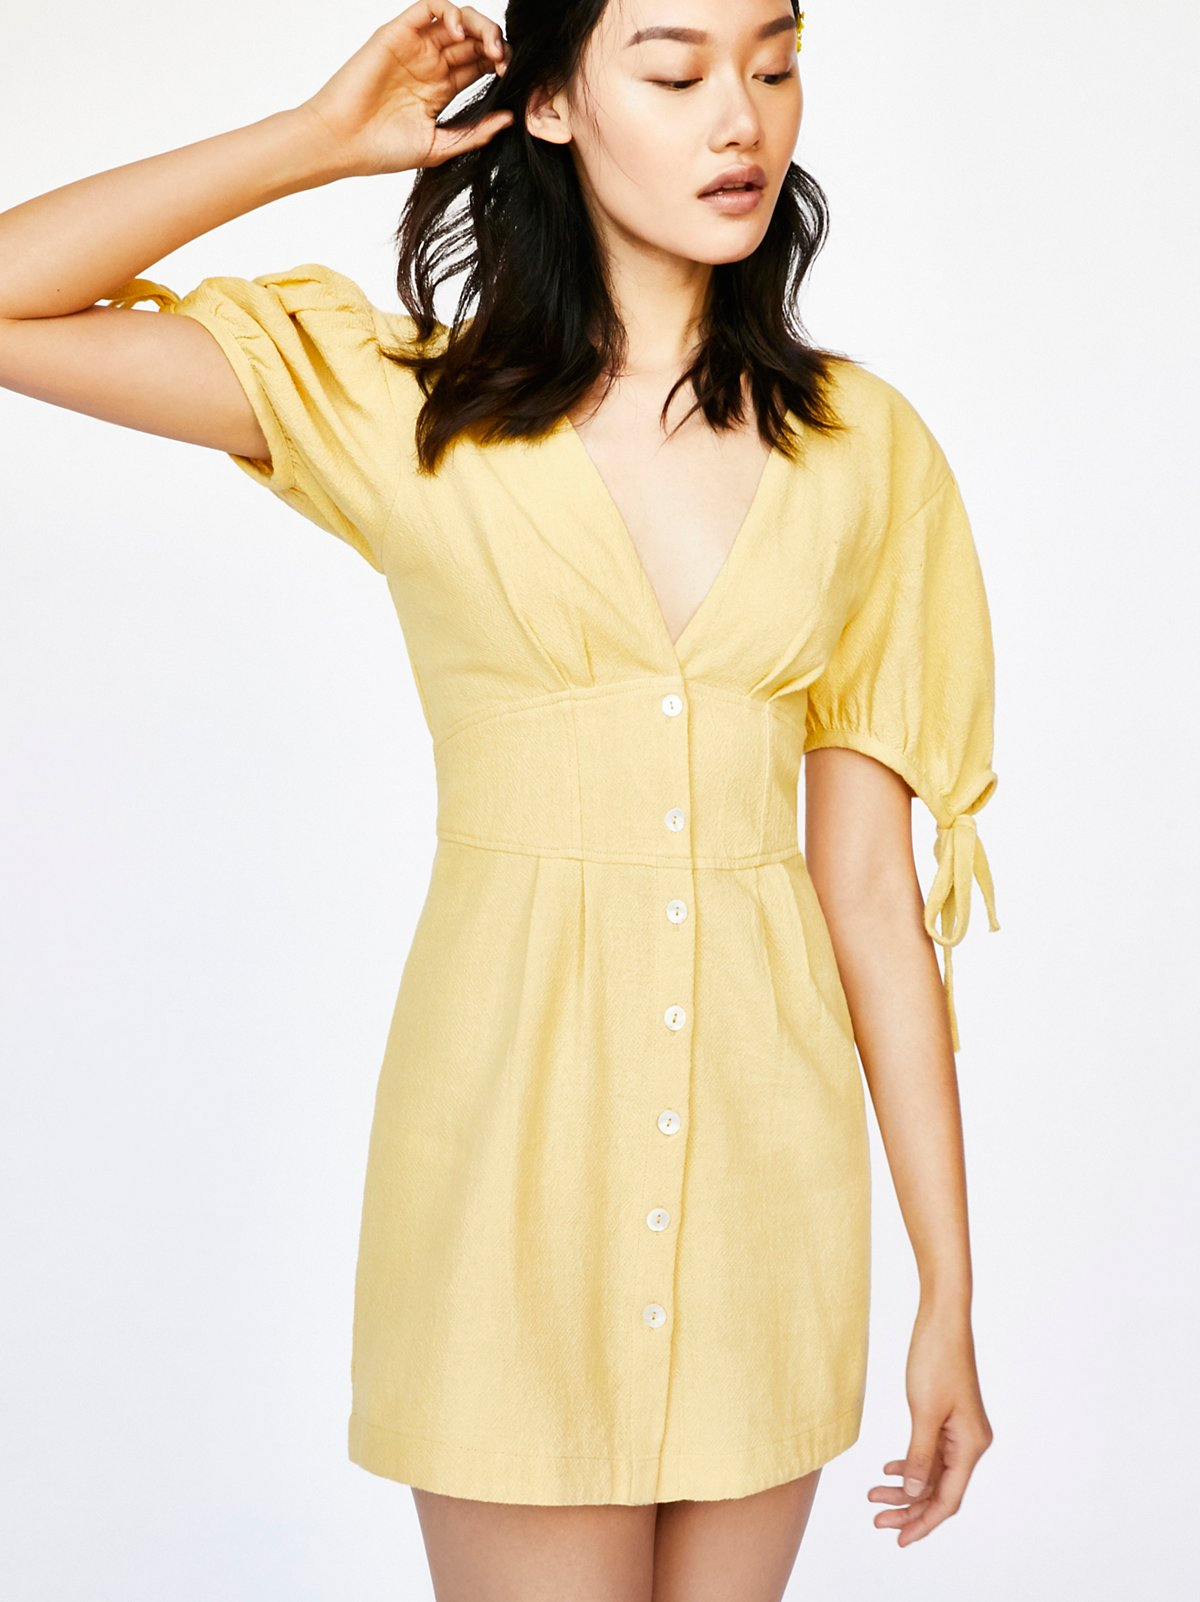 Doub连衣裙